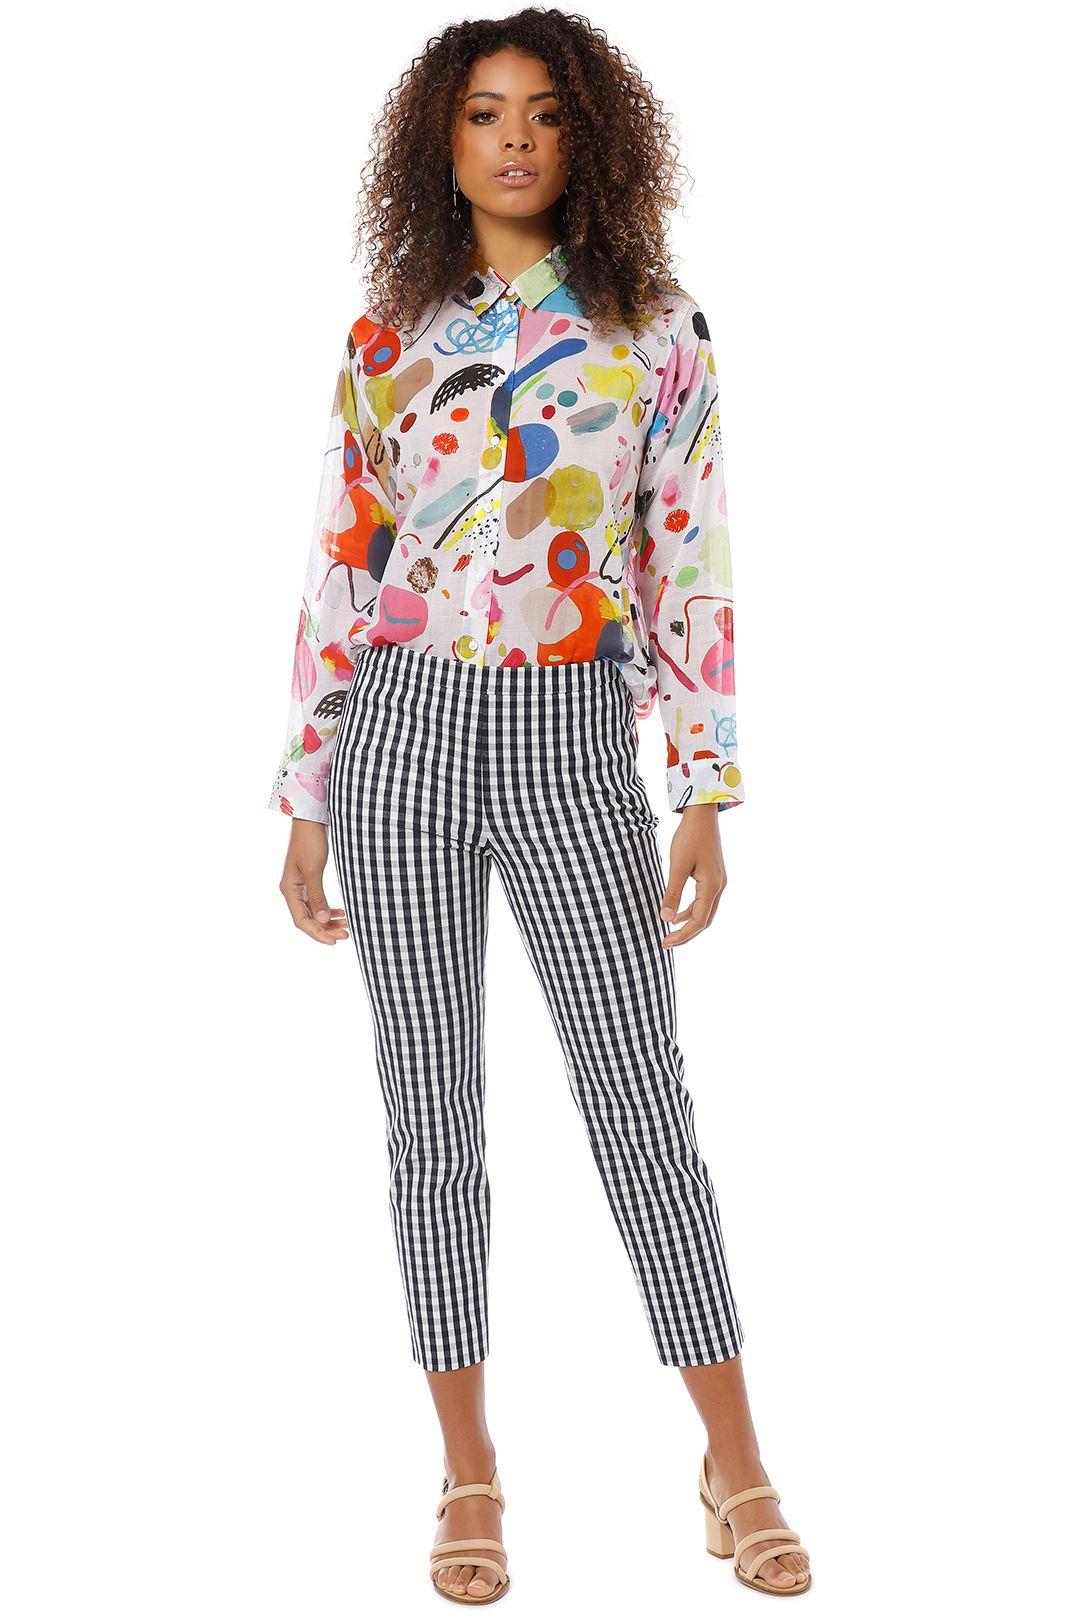 Gorman - Collage Shirt - Multi - Front